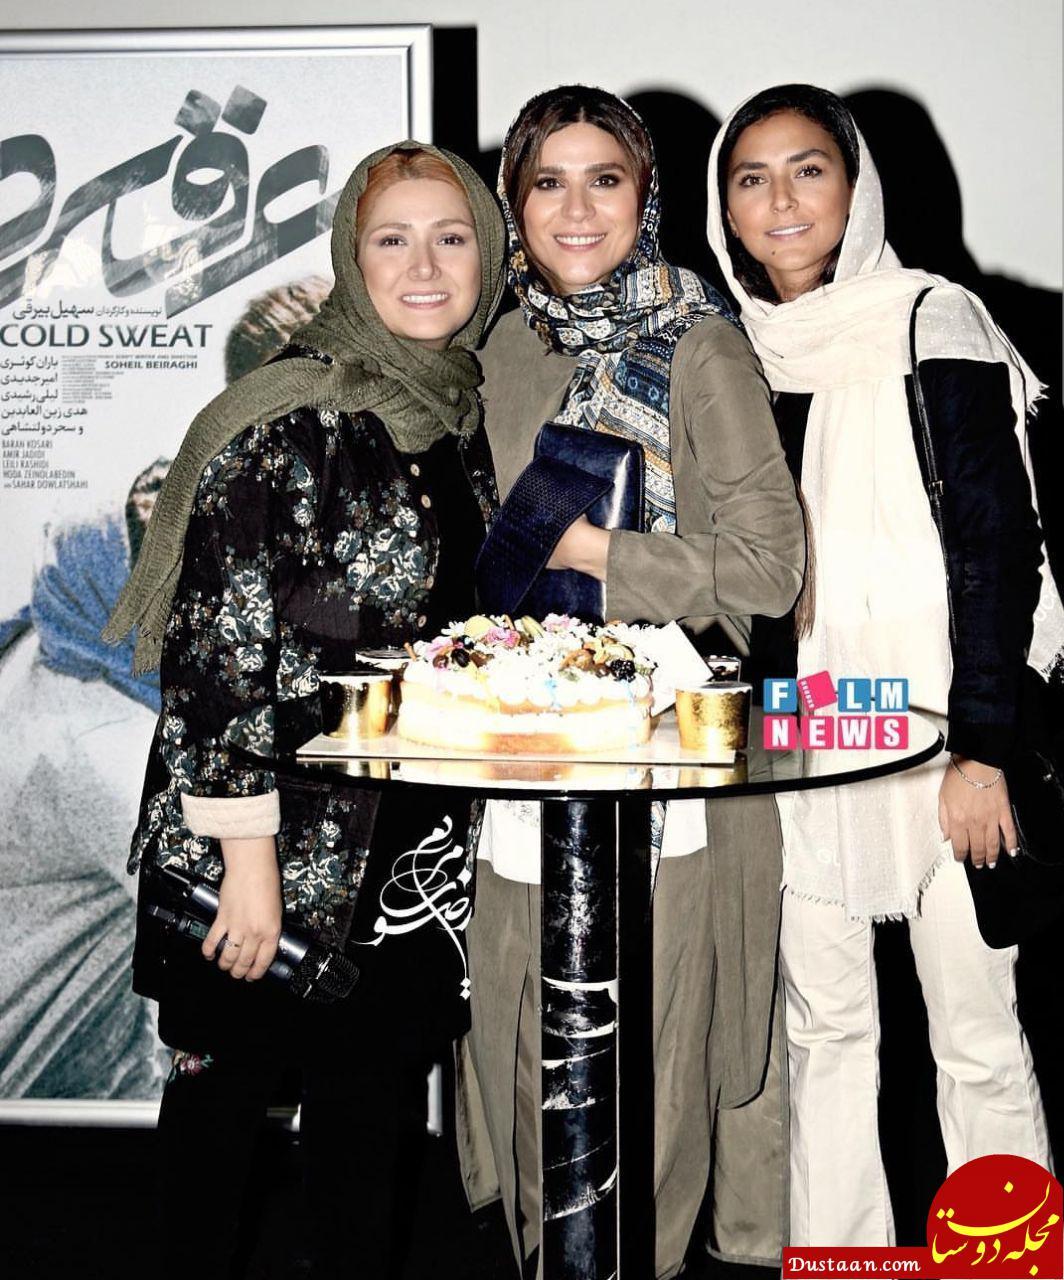 www.dustaan.com جشن تولد سحر دولتشاهی در اکران مردمی عرق سرد +عکس